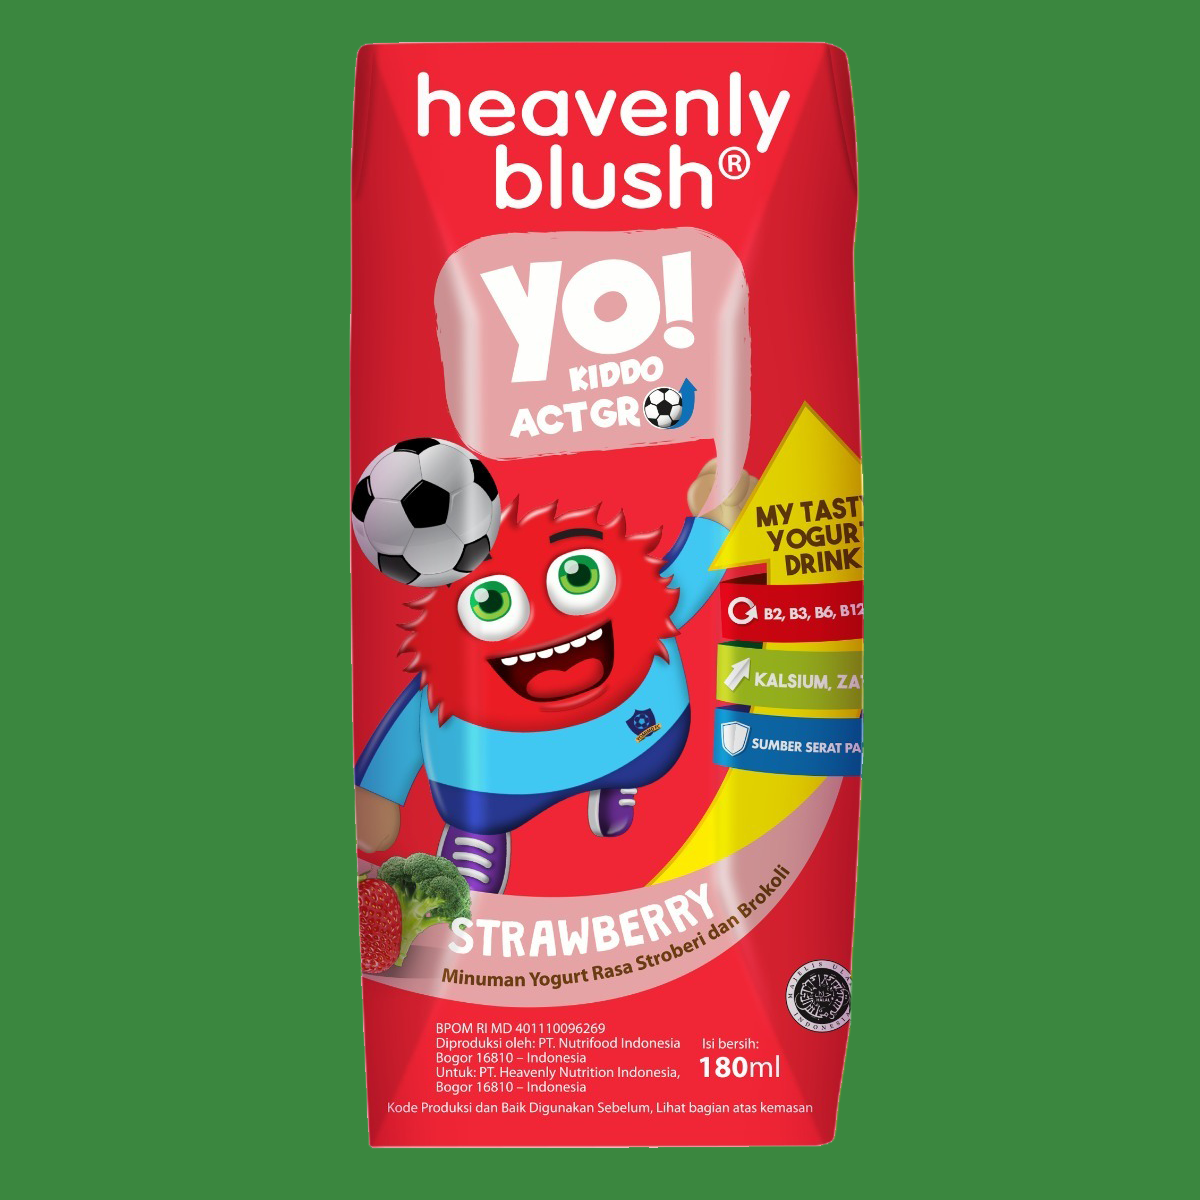 Heavenly Blush YO Strawberry Broccoli